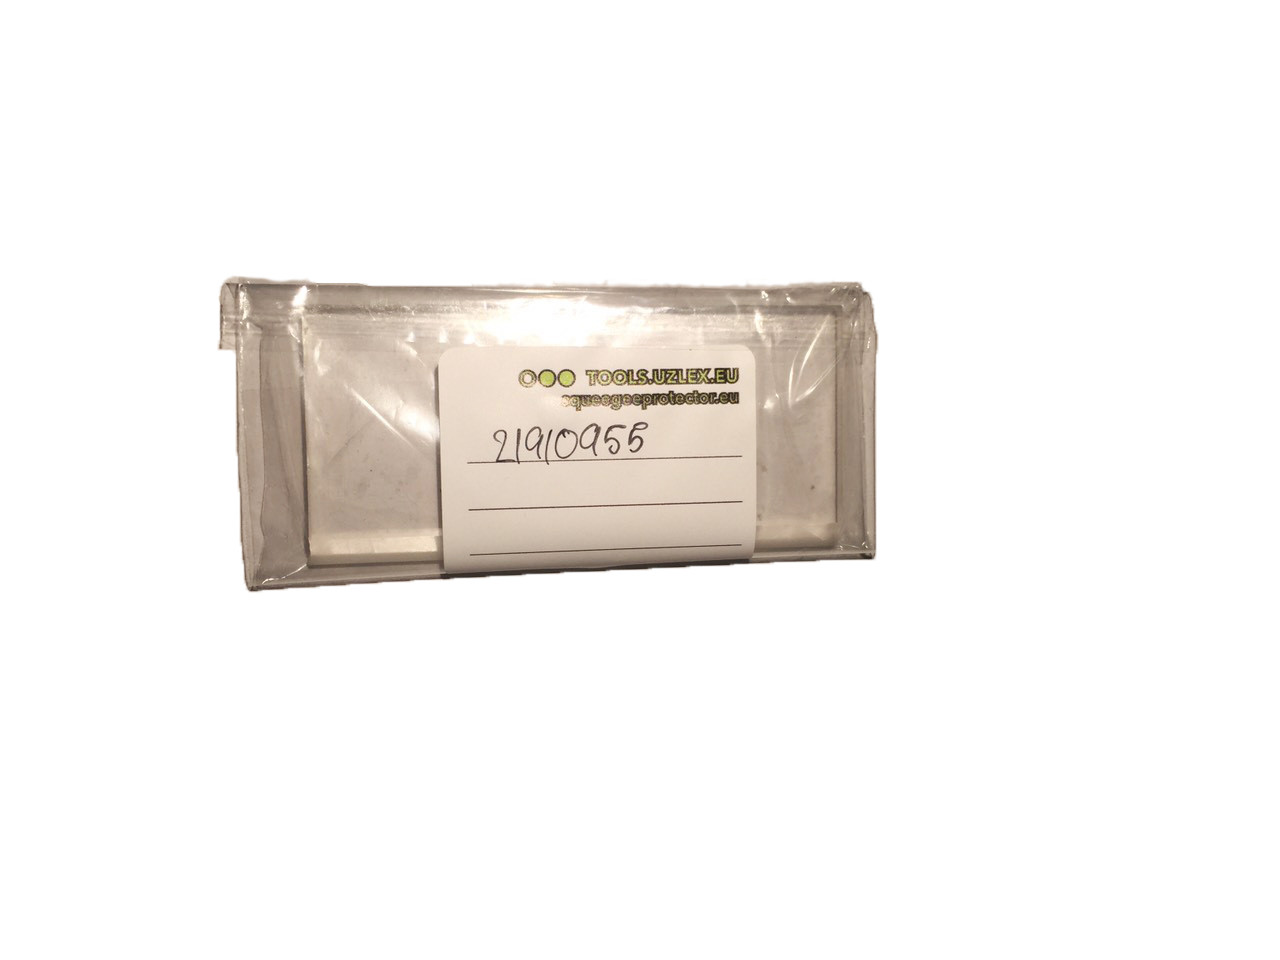 21910955 Полиуретановый скребок - PU - Uzlex squeegee 55 x 100mm